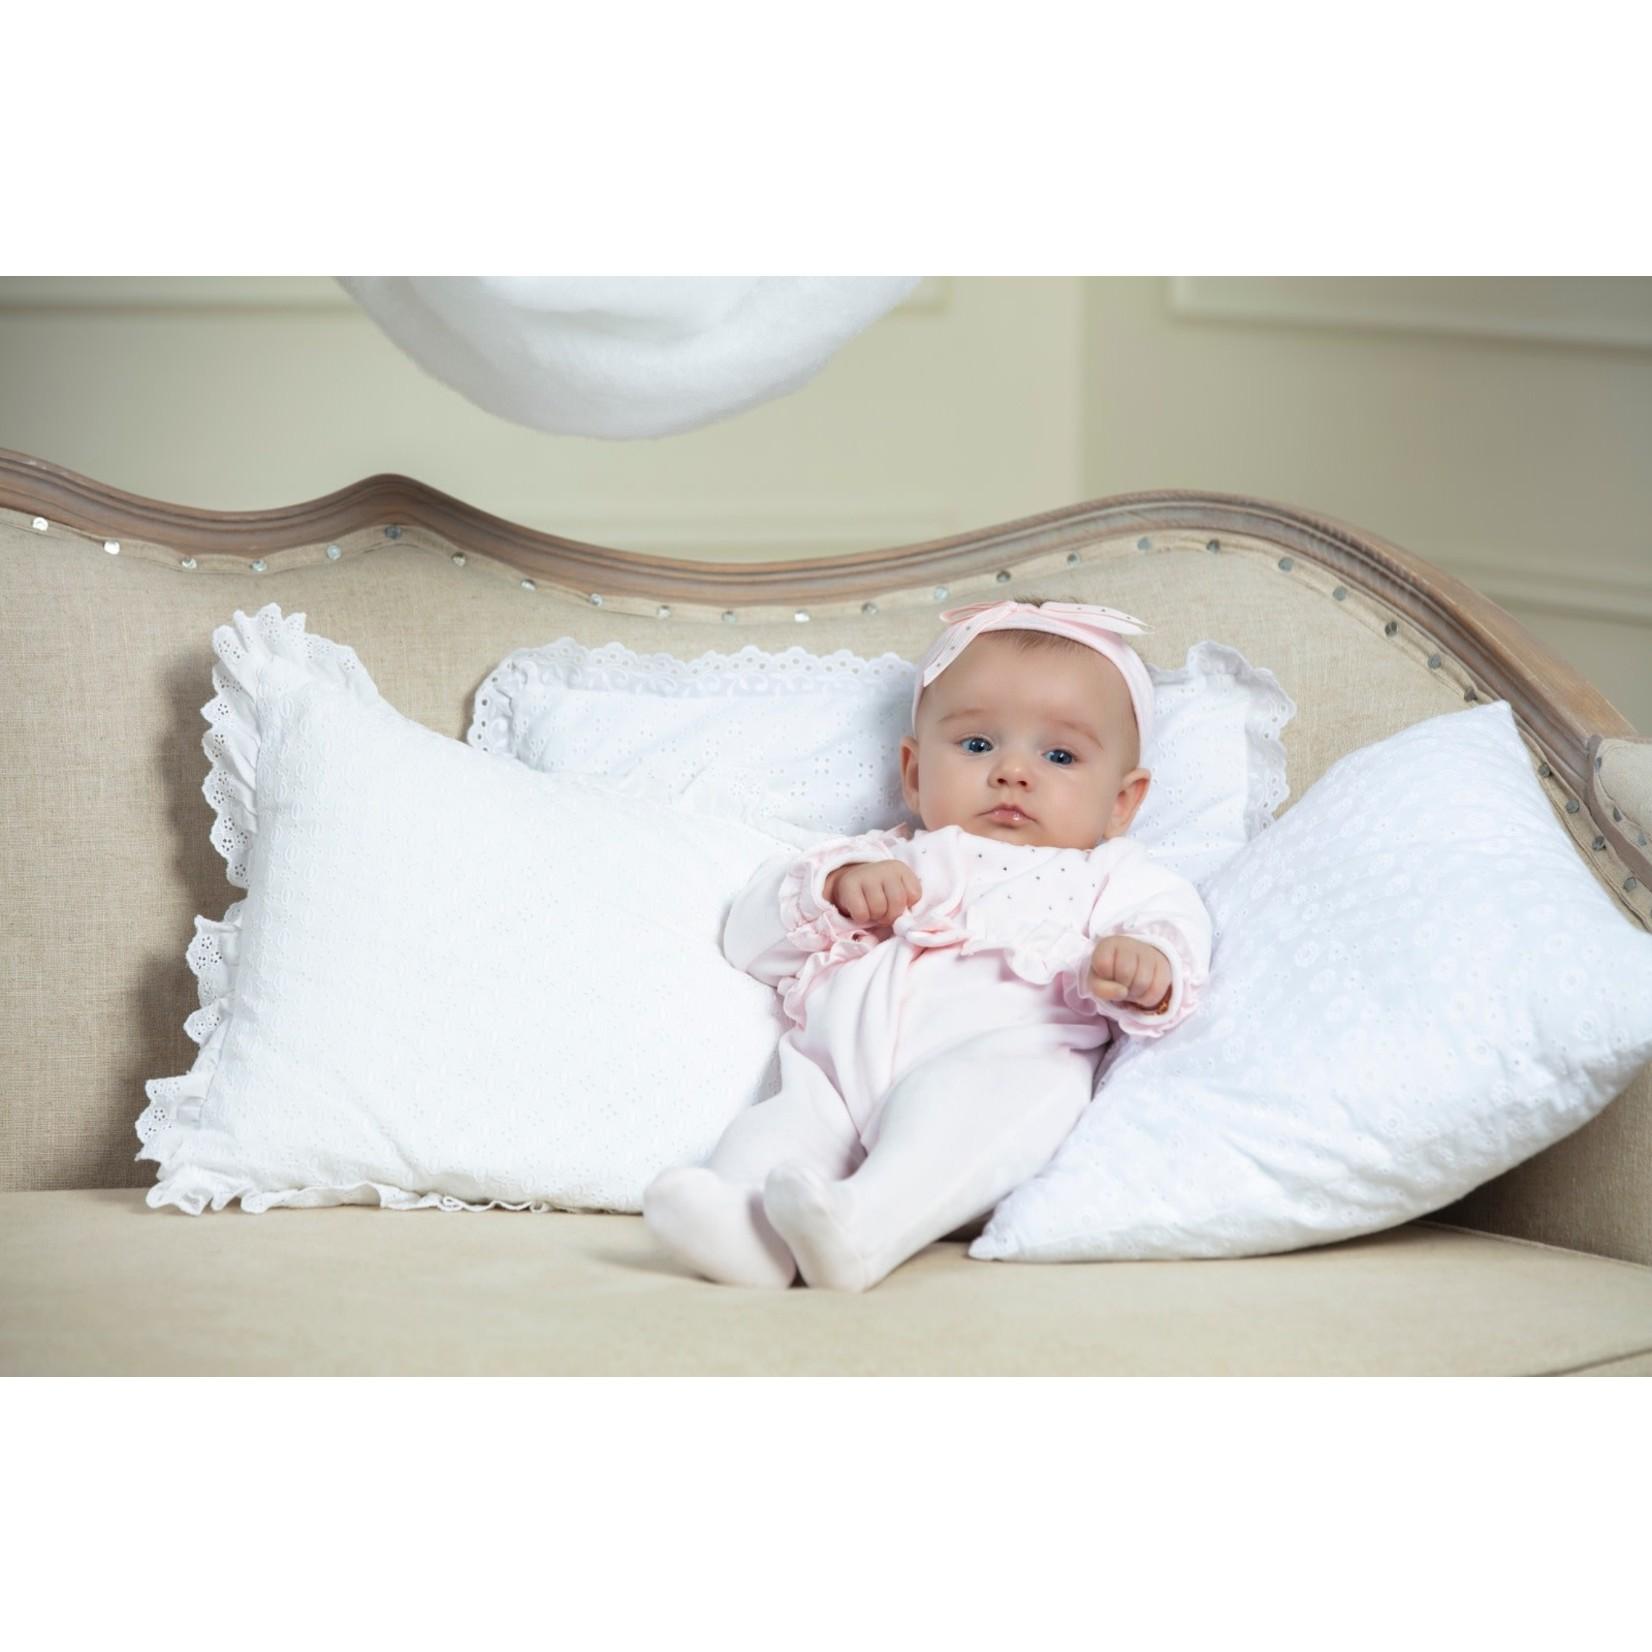 Newborn Baby Glitter -  Patachou